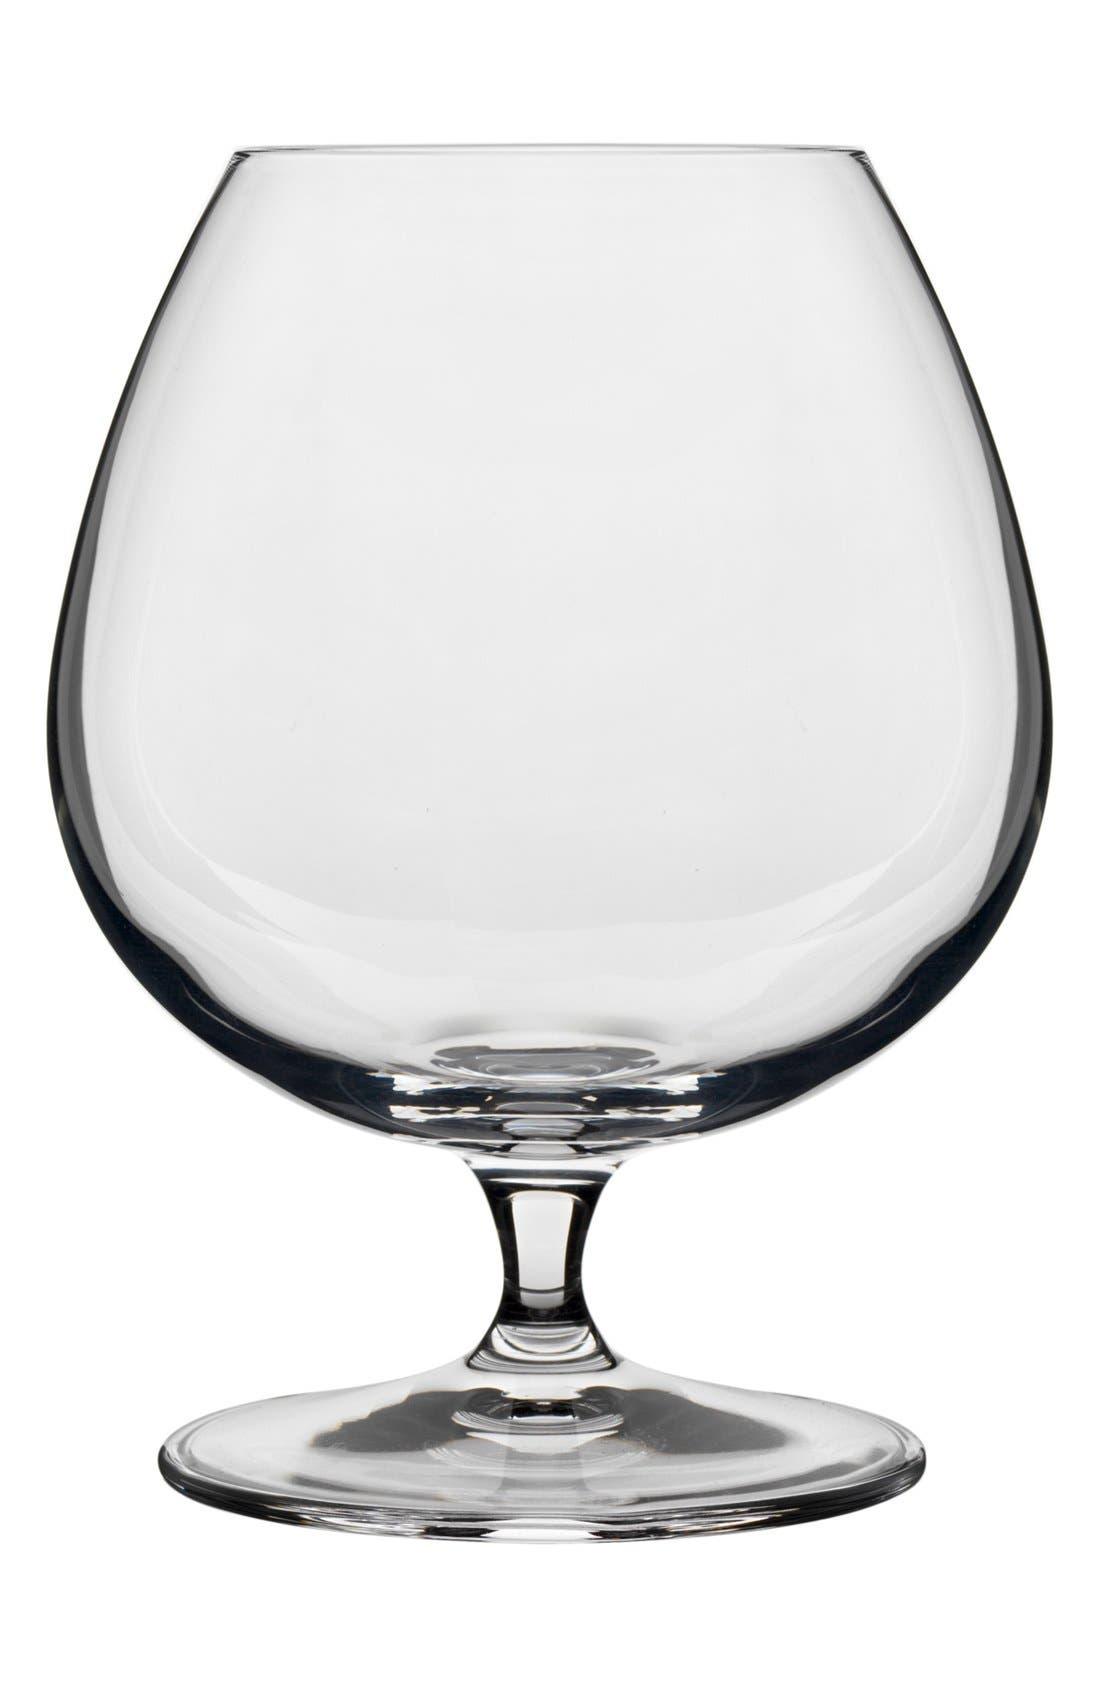 'Crescendo' Cognac Glasses,                             Main thumbnail 1, color,                             Clear